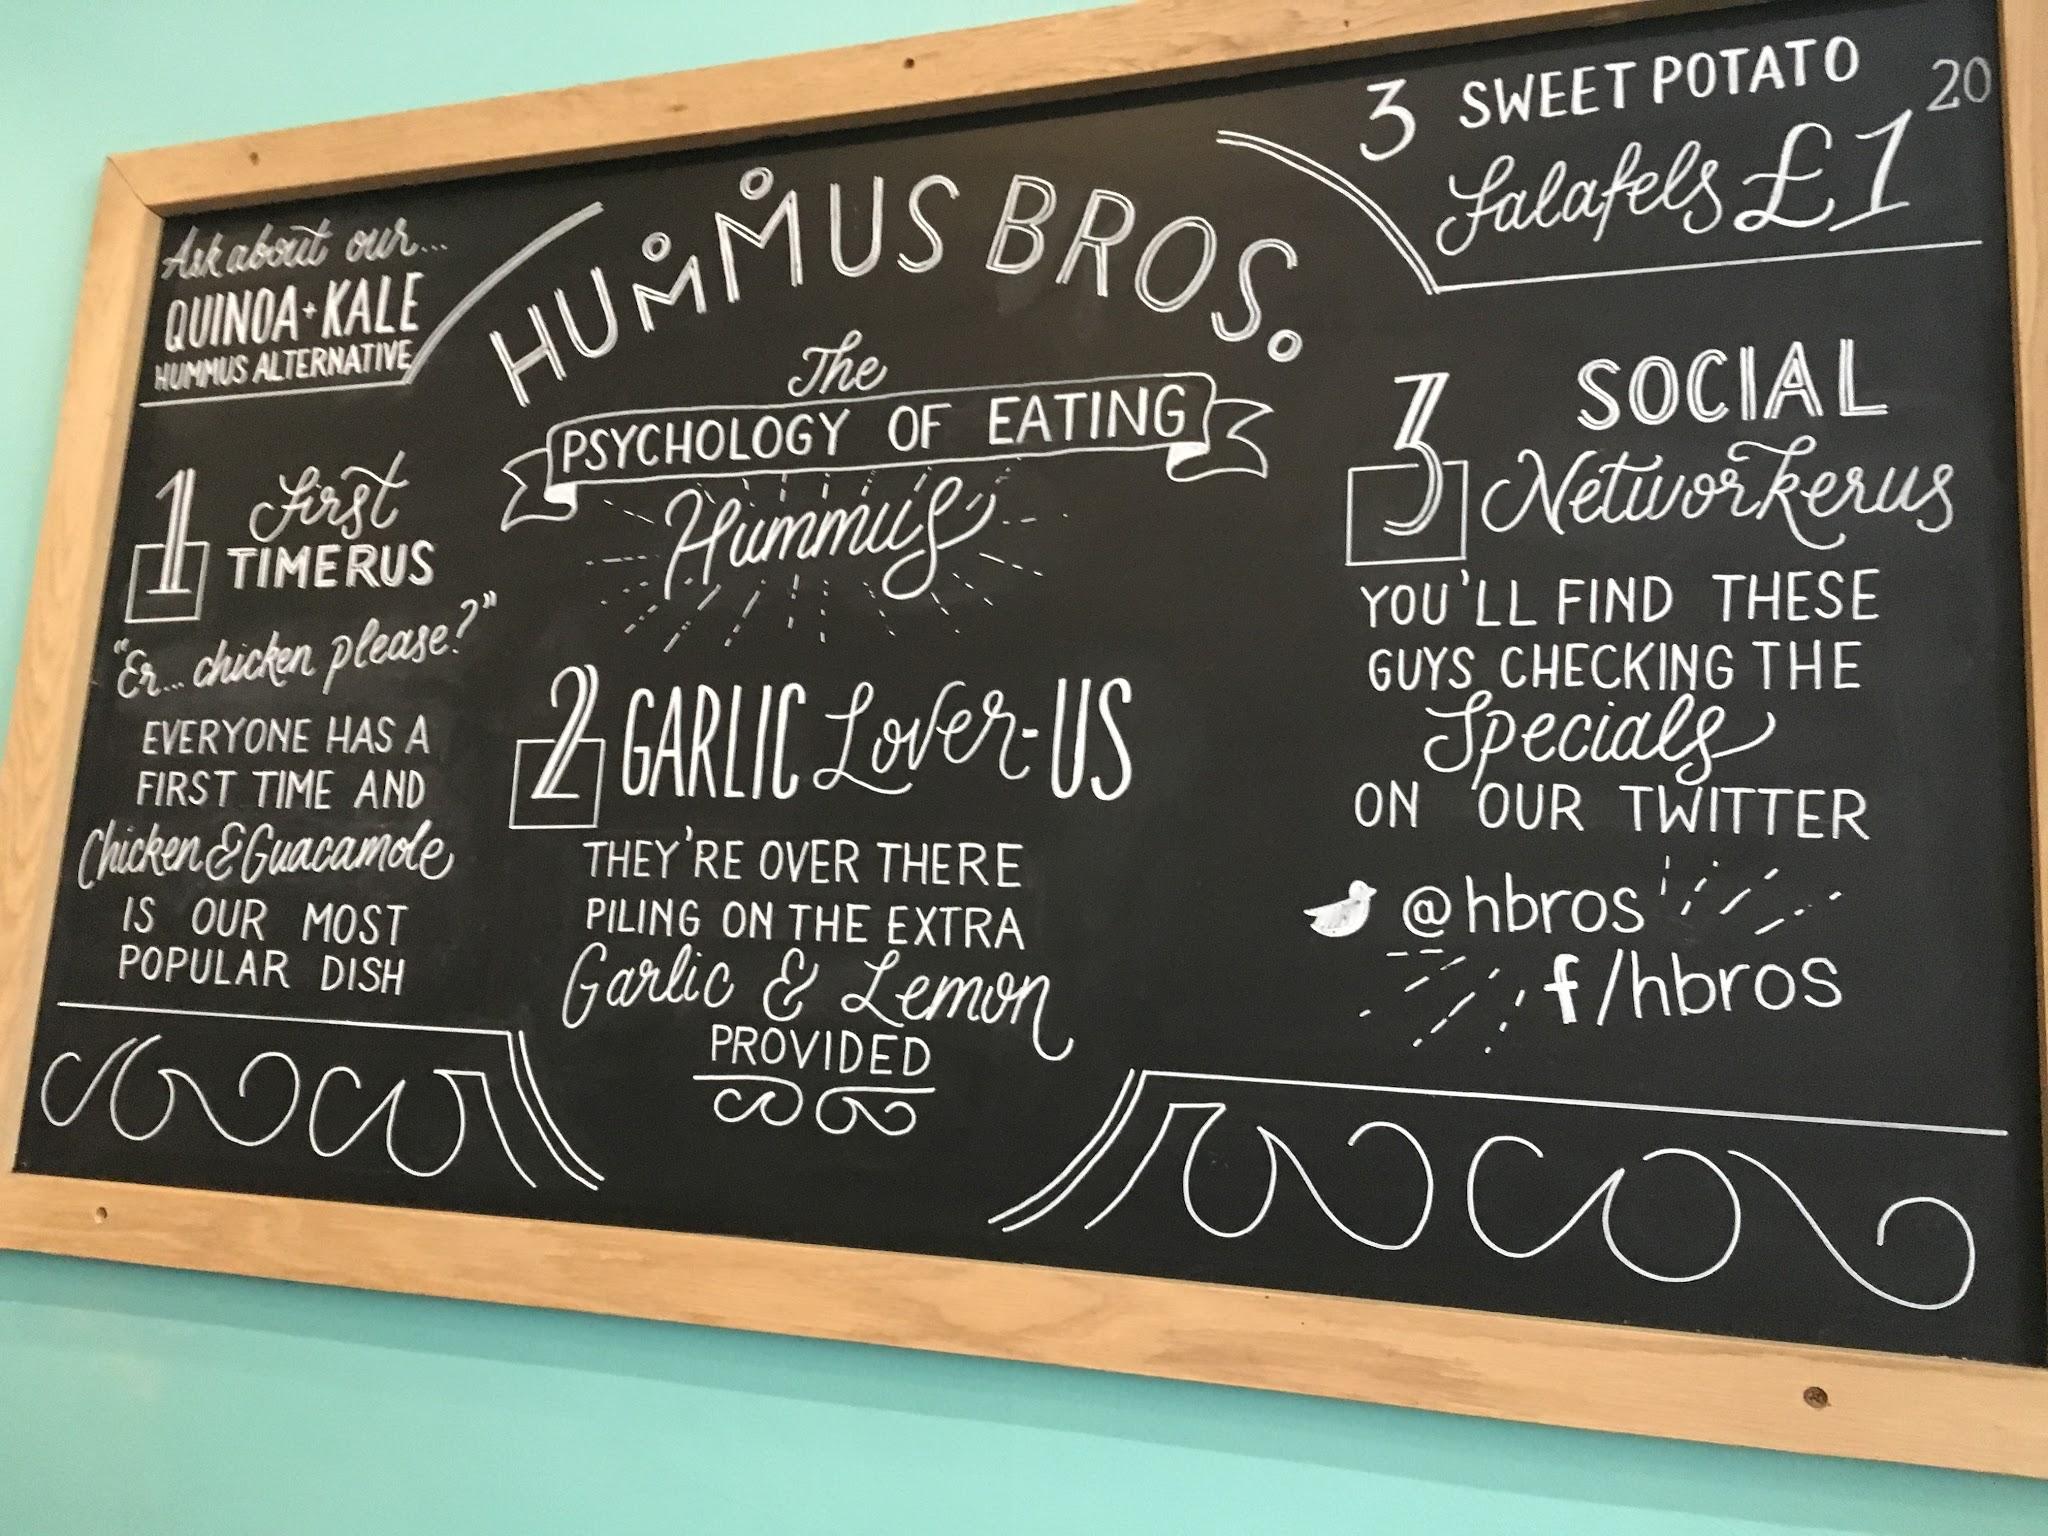 Hummus Bros